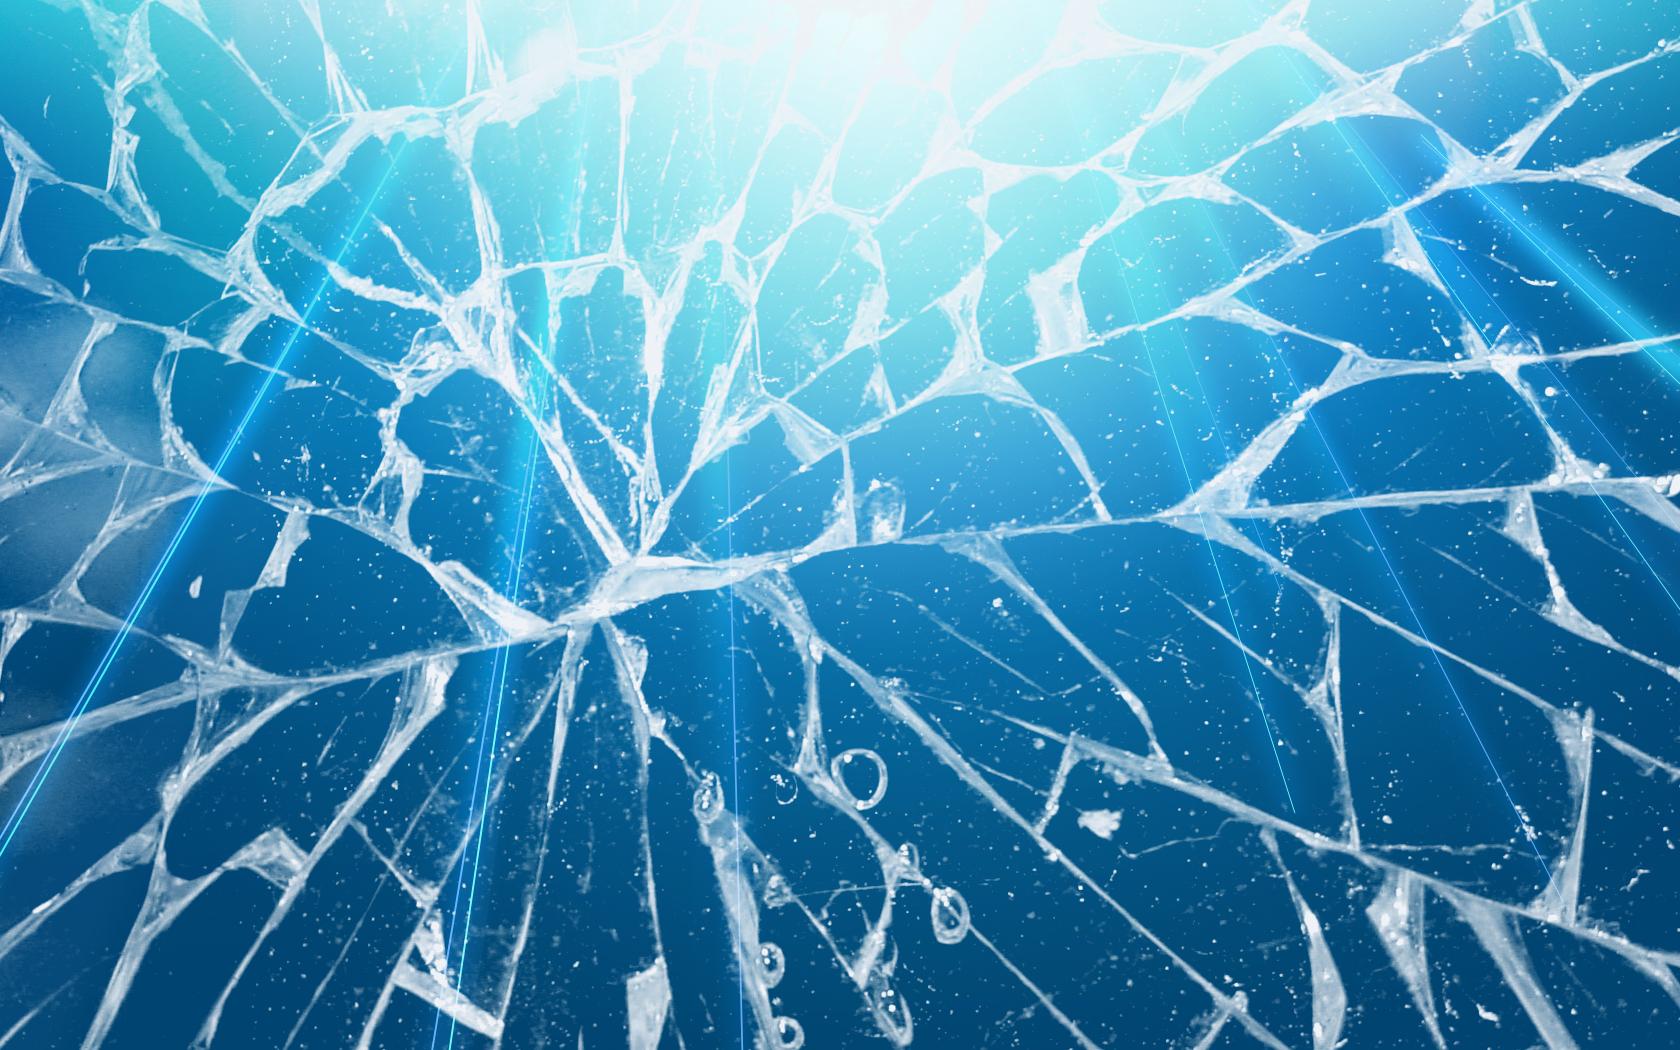 cracked screen windows vista hd wallpaper 2264 1680x1050